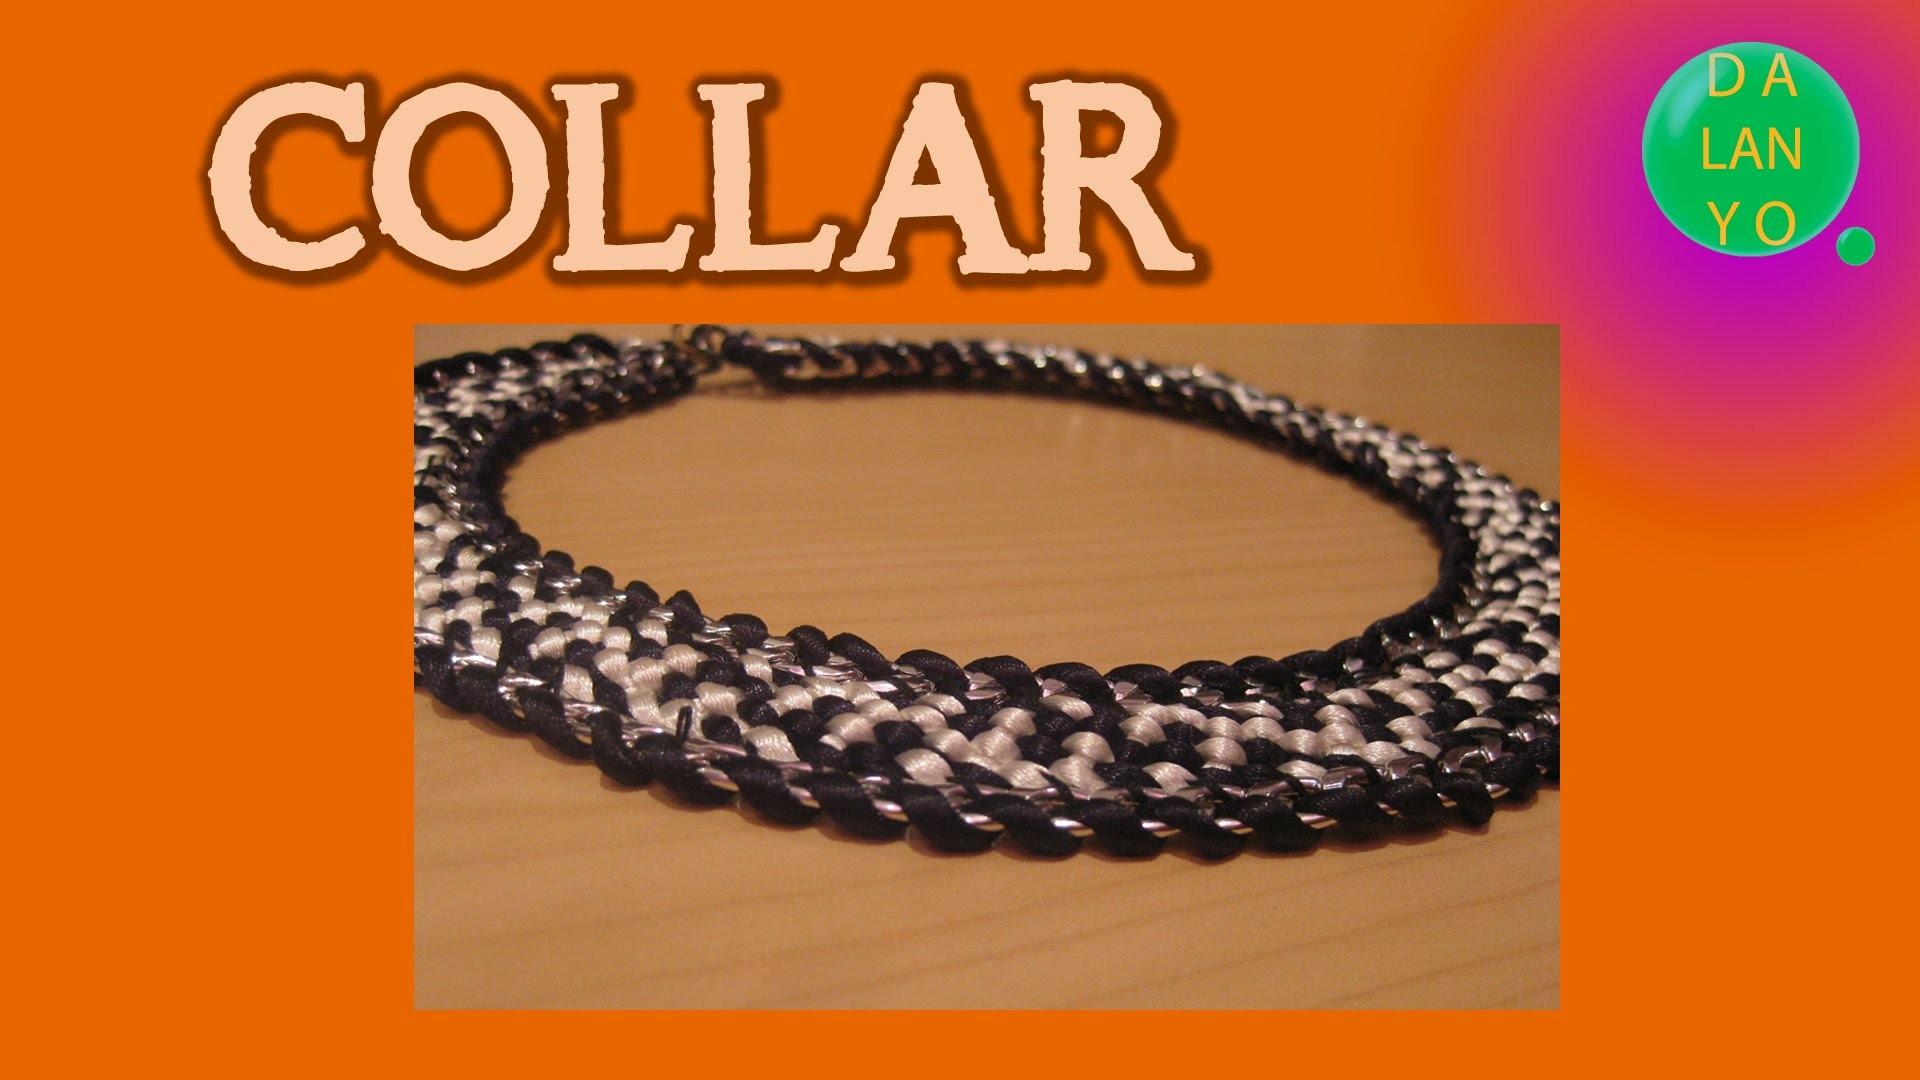 Collar plateado con cadena metalica | Collares Kumihimo | Tutorial | Es.Pandahall.com